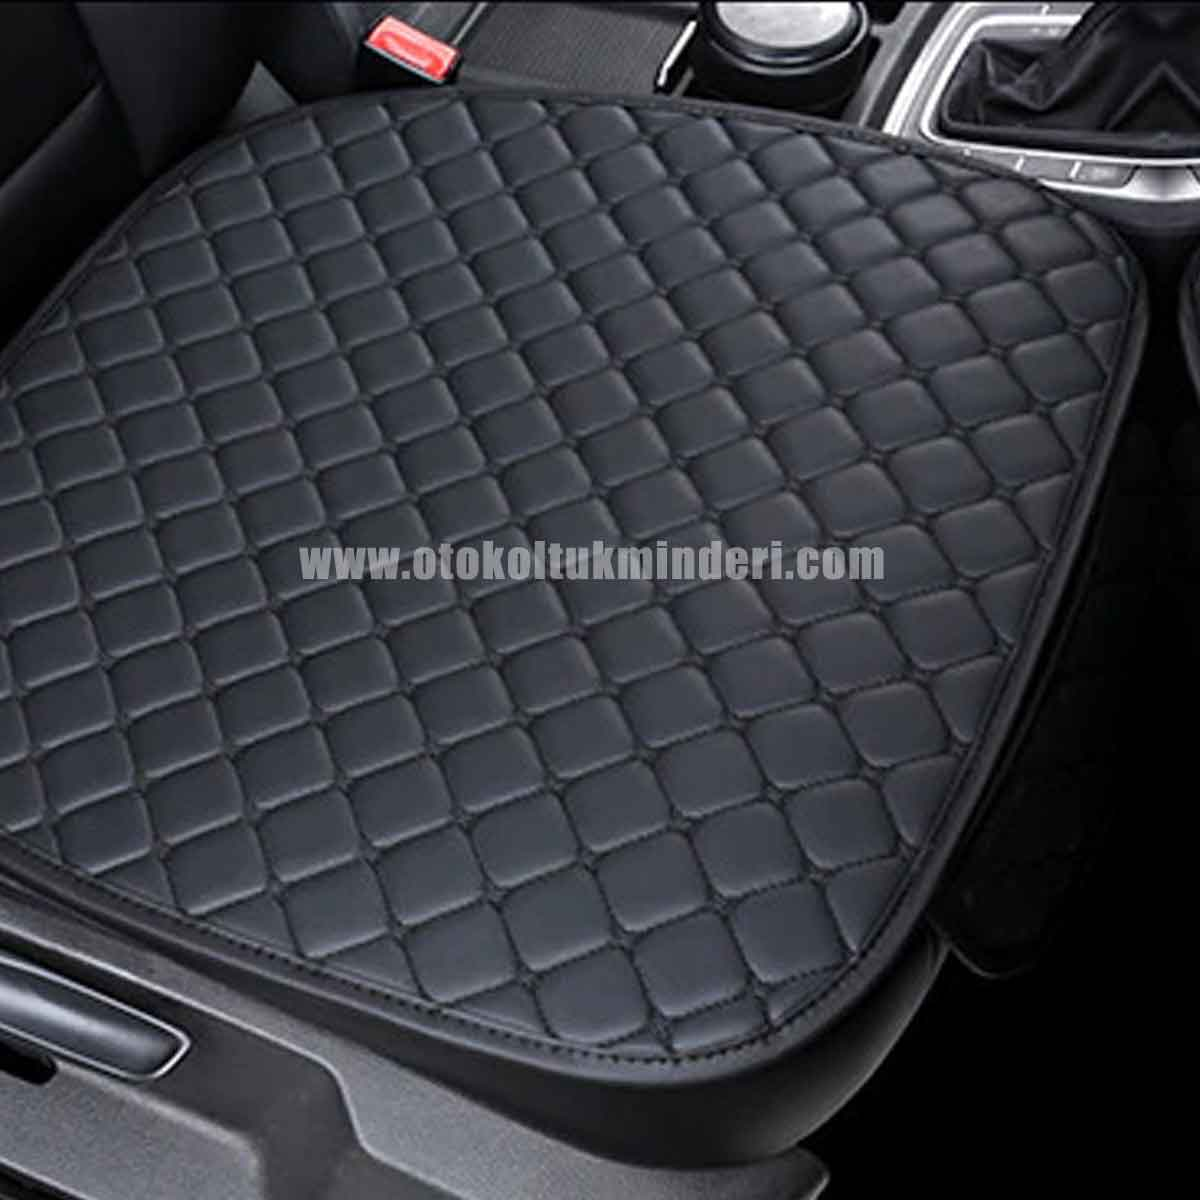 Mazda oto koltuk kılıfı